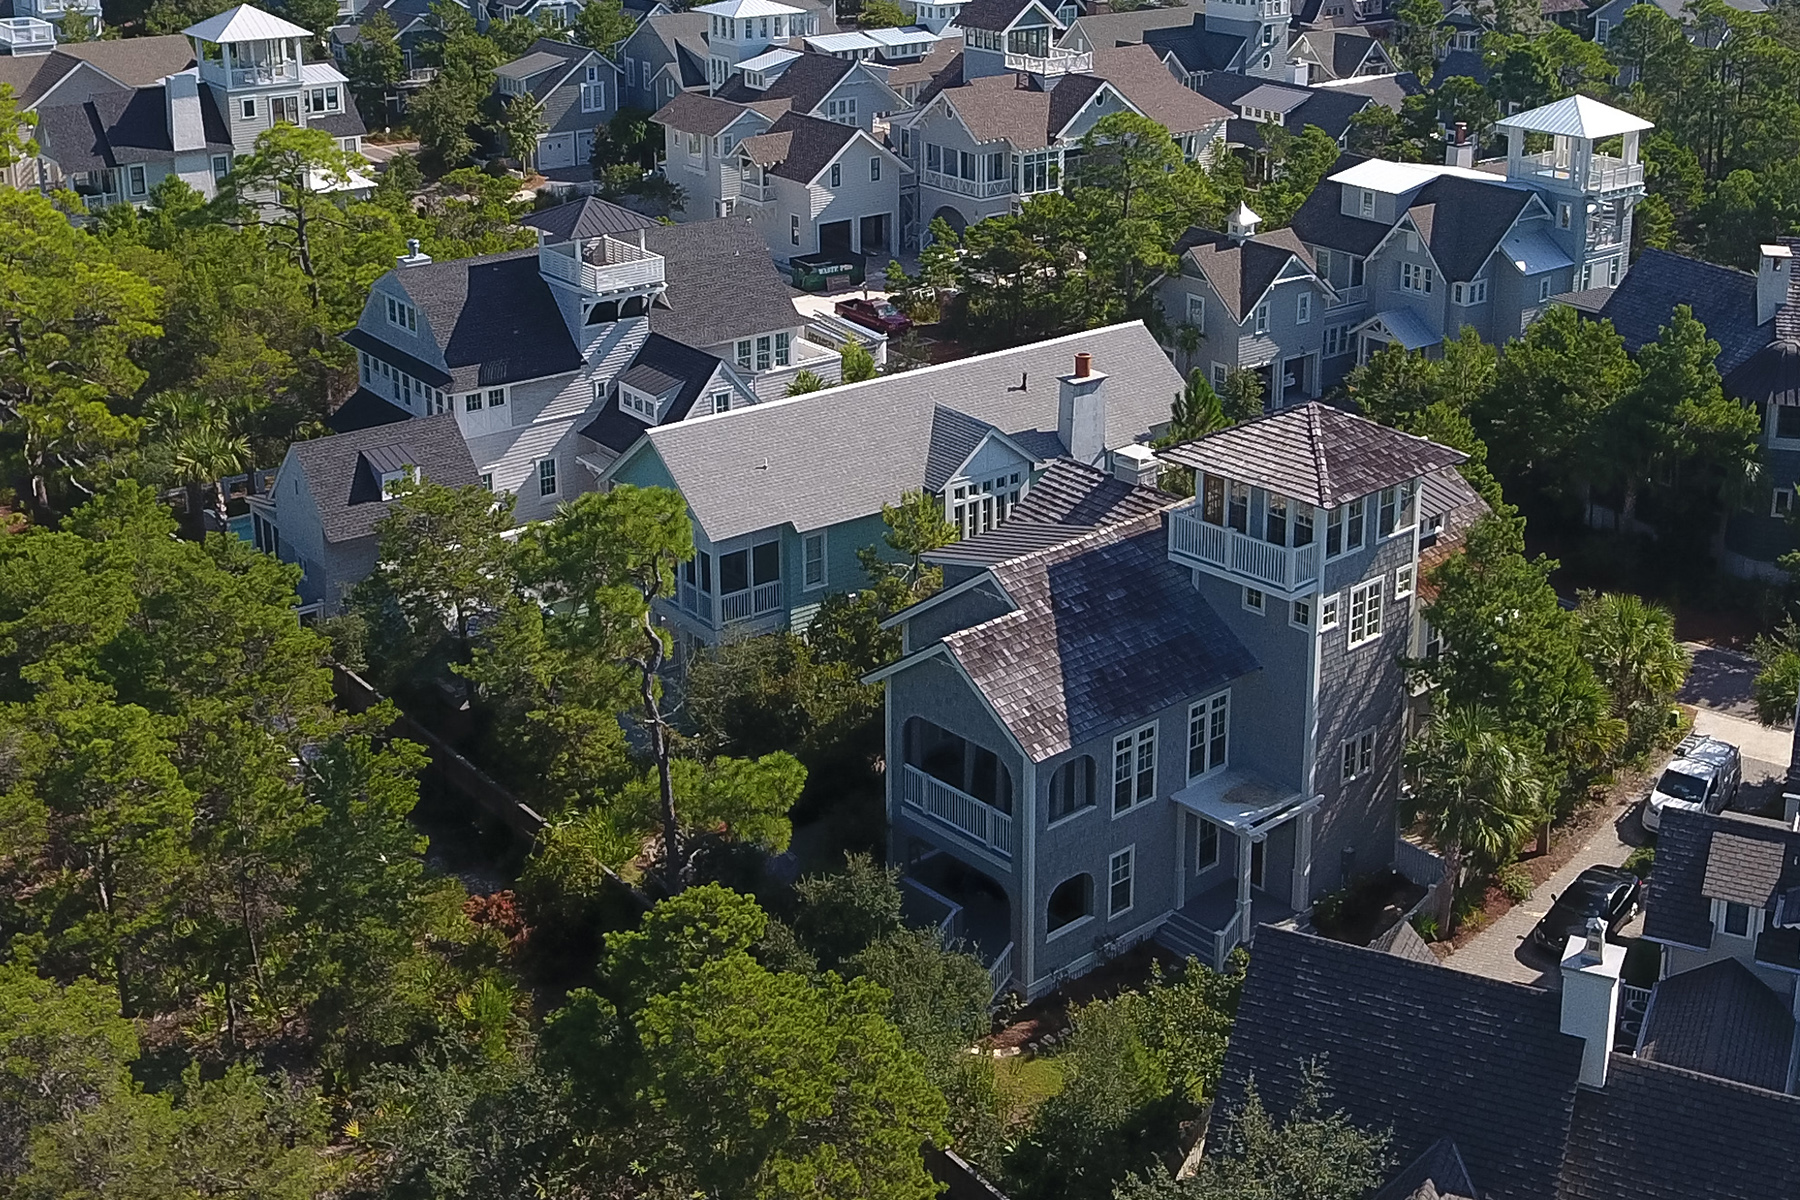 Moradia para Venda às BEAUTIFULLY DECORATED BORDERING TRANQUIL STATE PAR 148 Coopersmith Lane Watersound, Florida, 32461 Estados Unidos